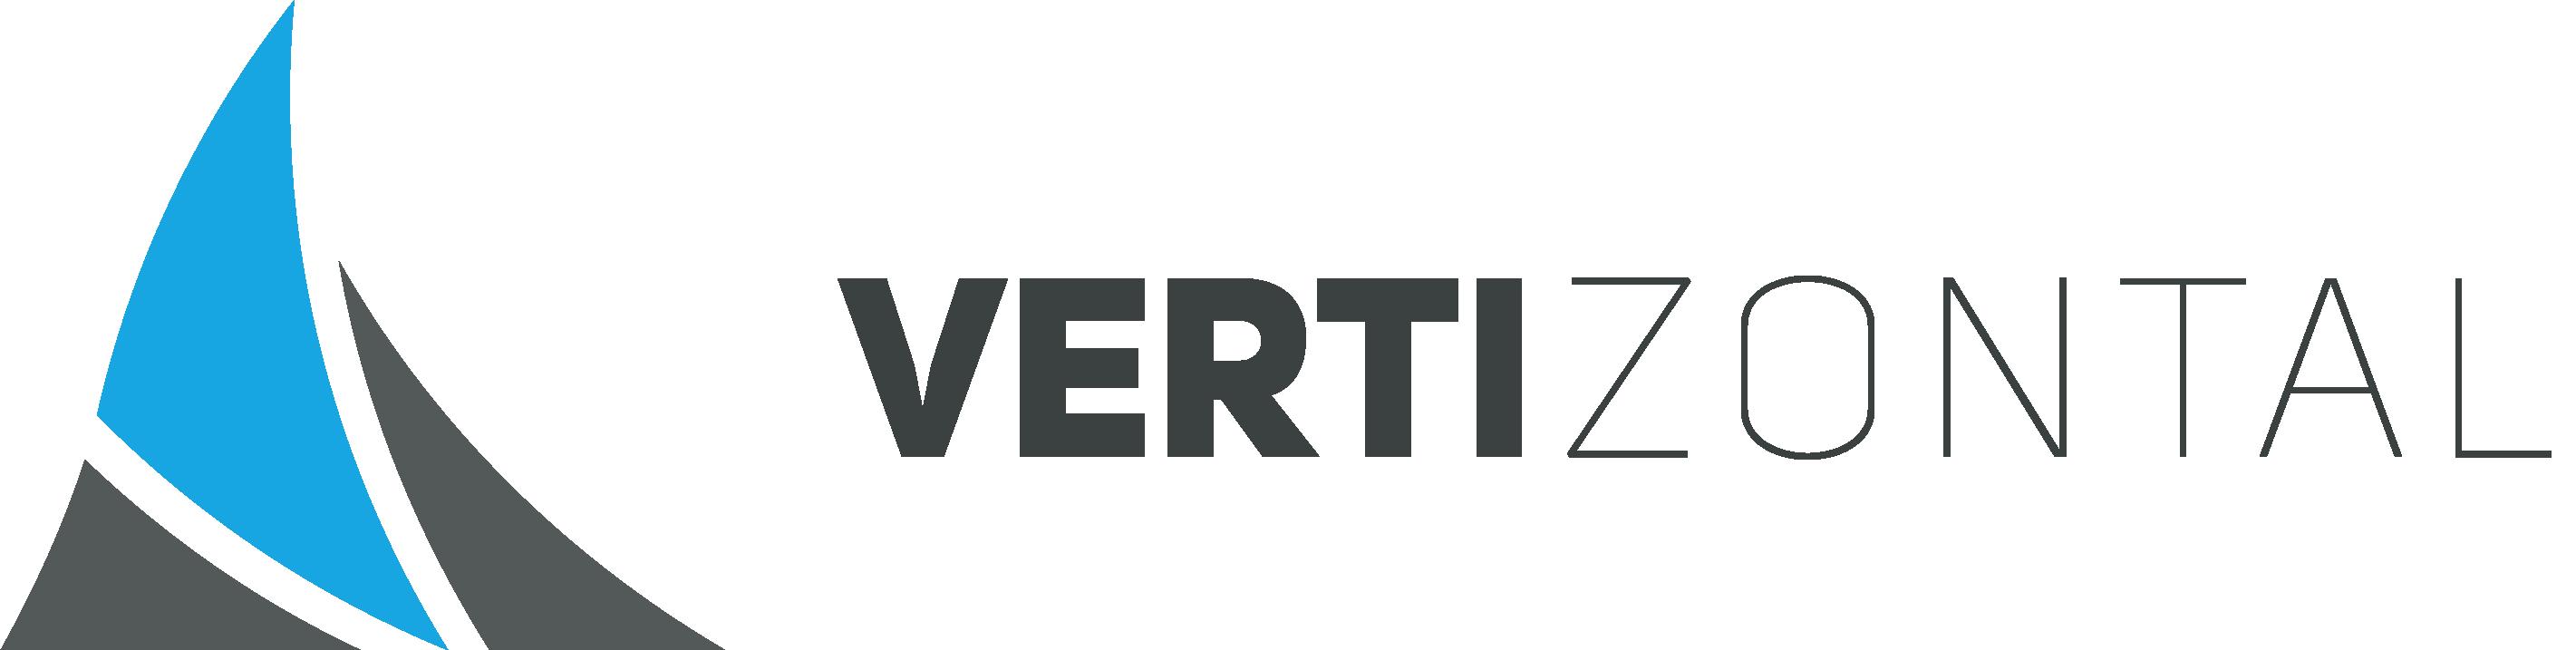 vertizontal